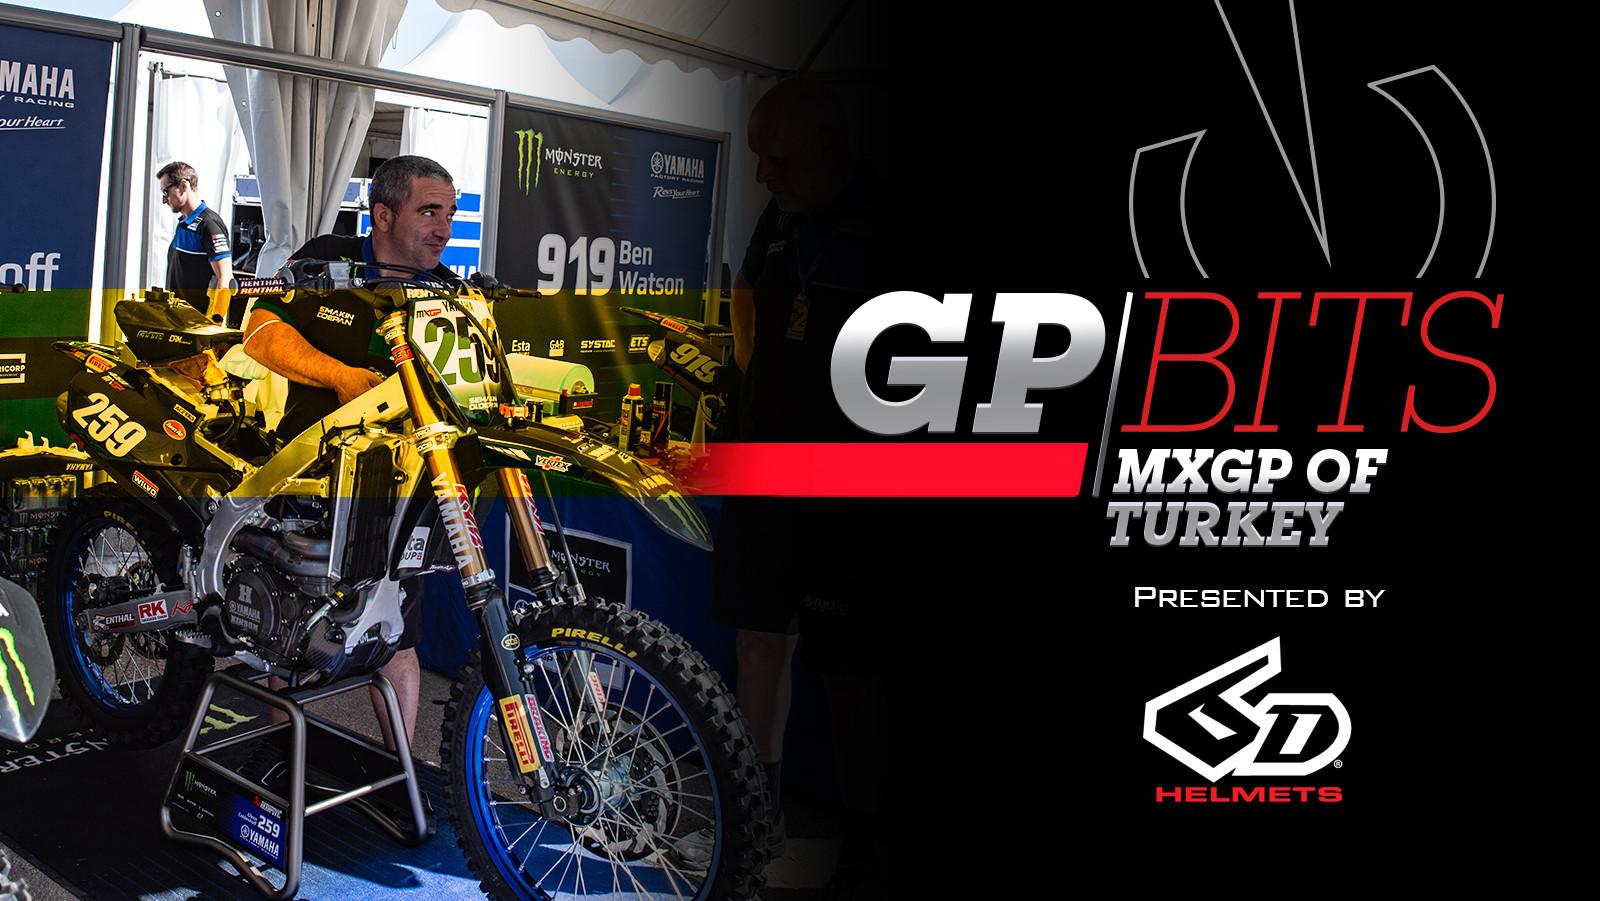 GP Bits: MXGP of Turkey | Round 8